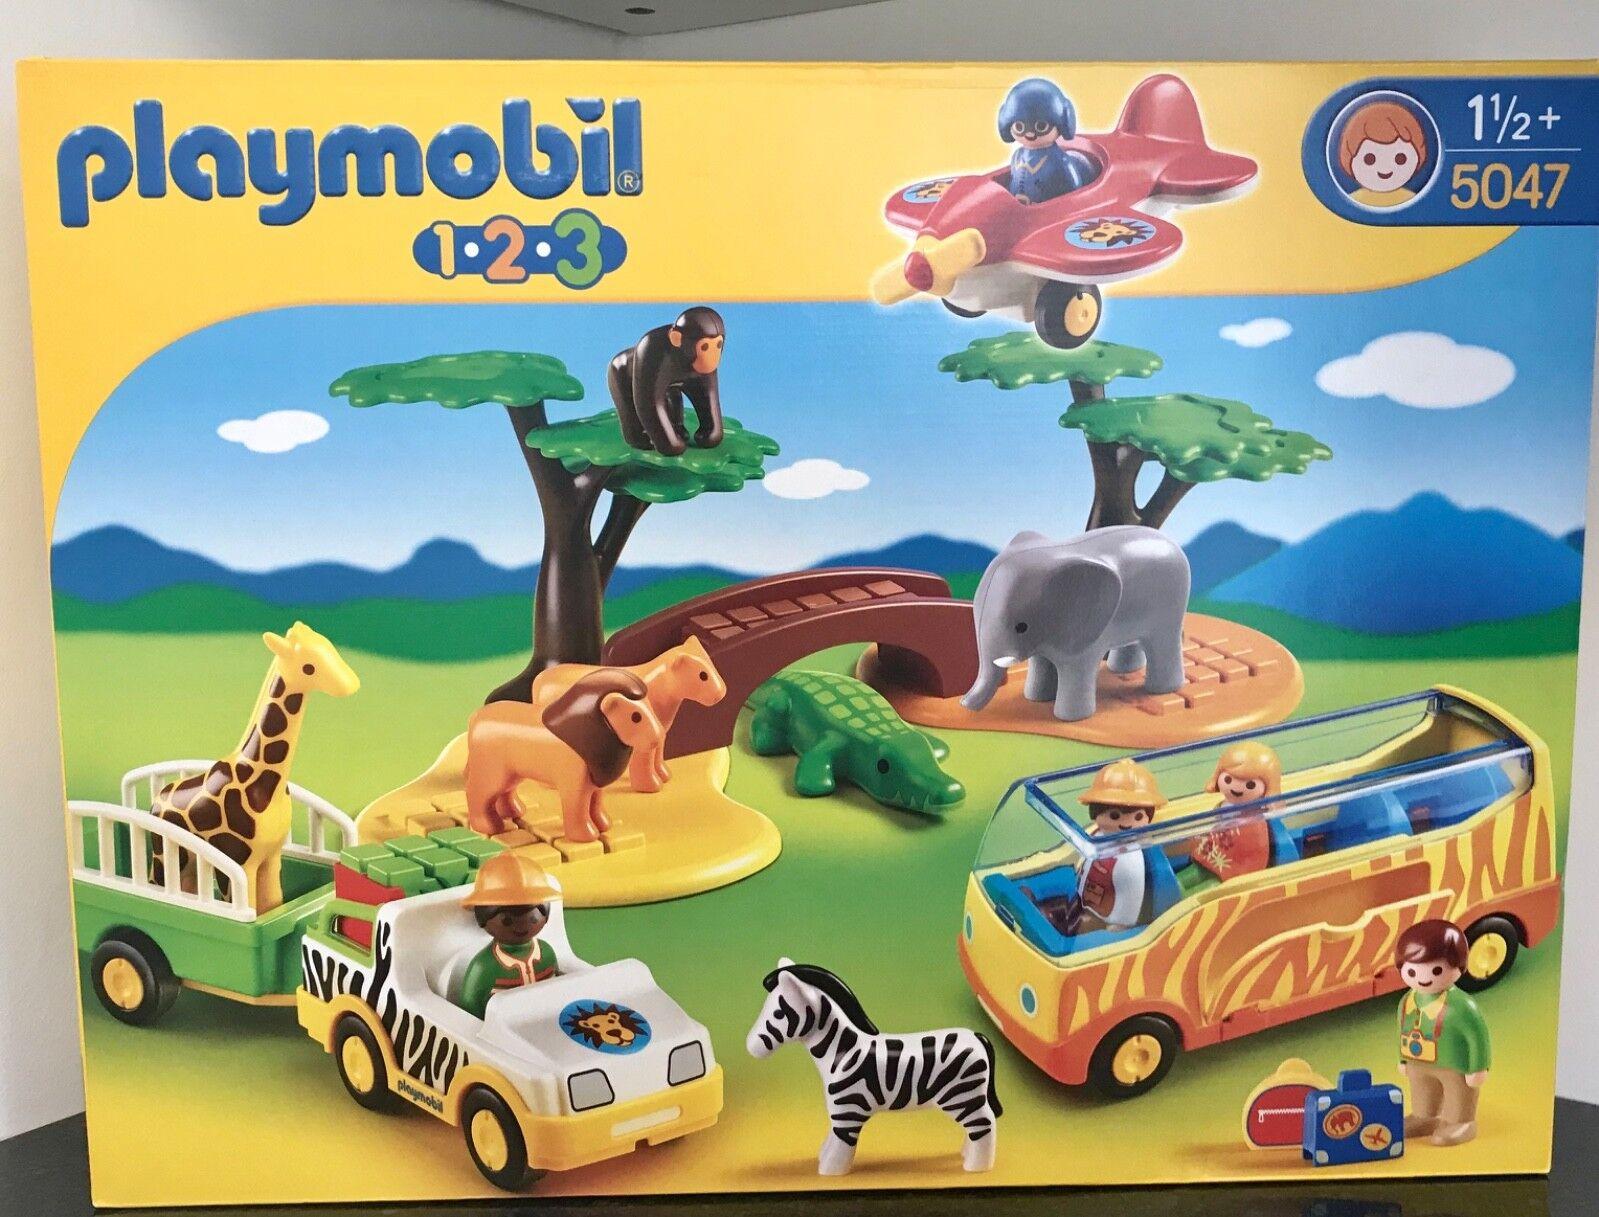 PLAYMOBIL 5047 Safari Zoo 123 Play Set Animals People Jeep Bus Aeroplane